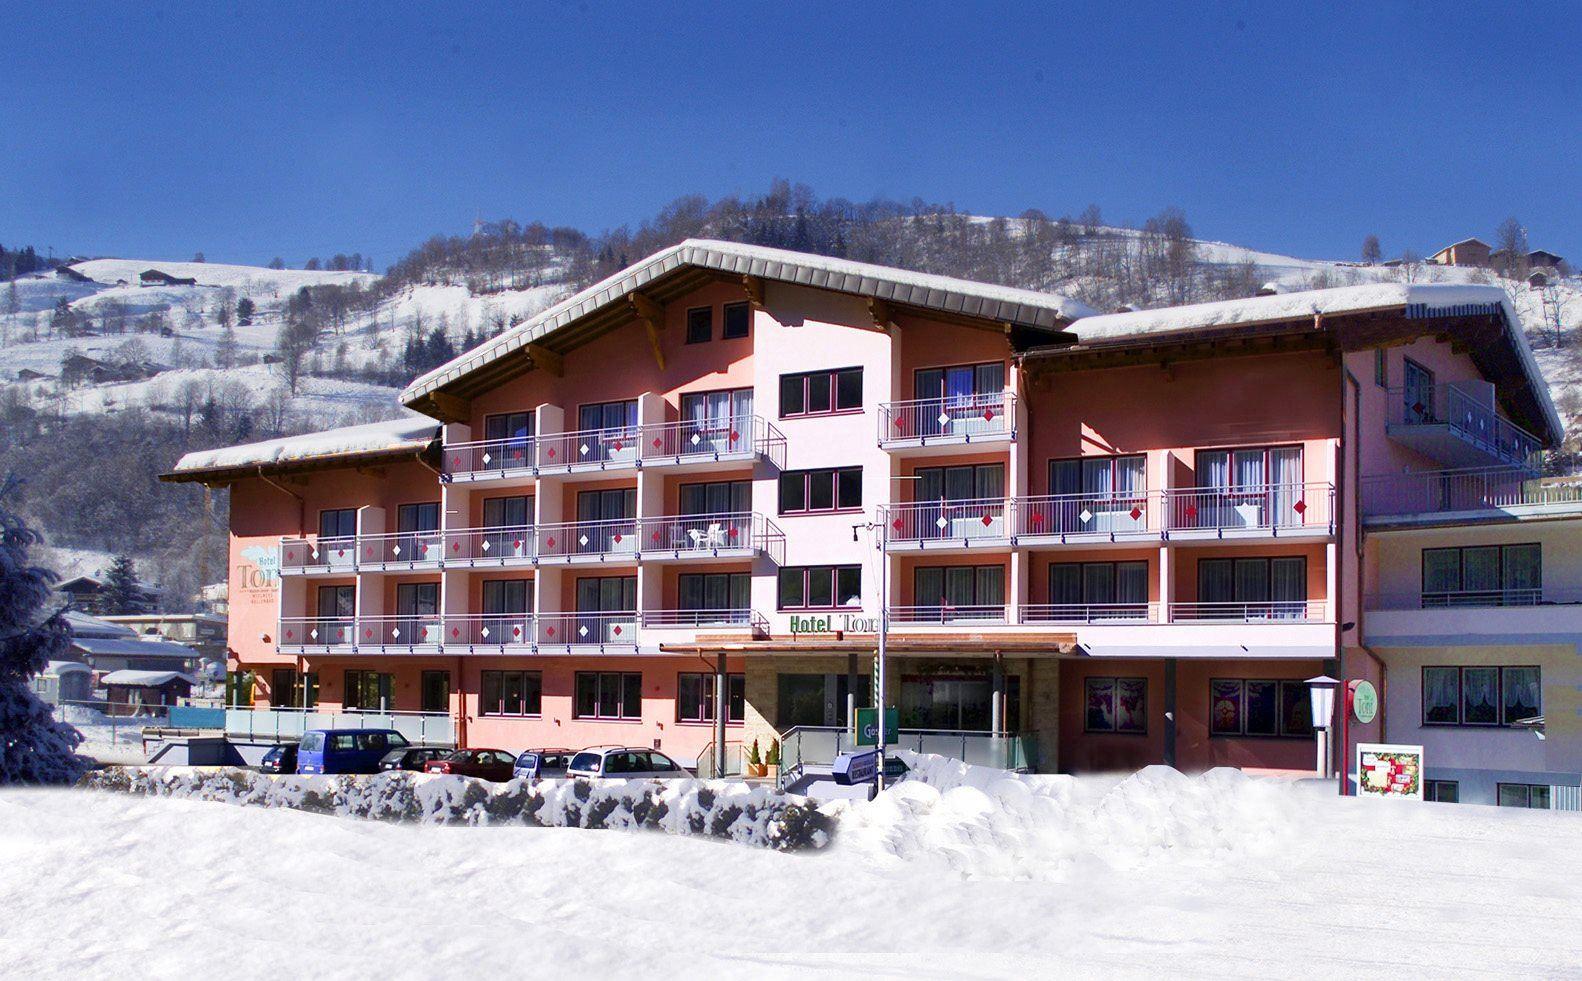 Hotel Toni Kaprun